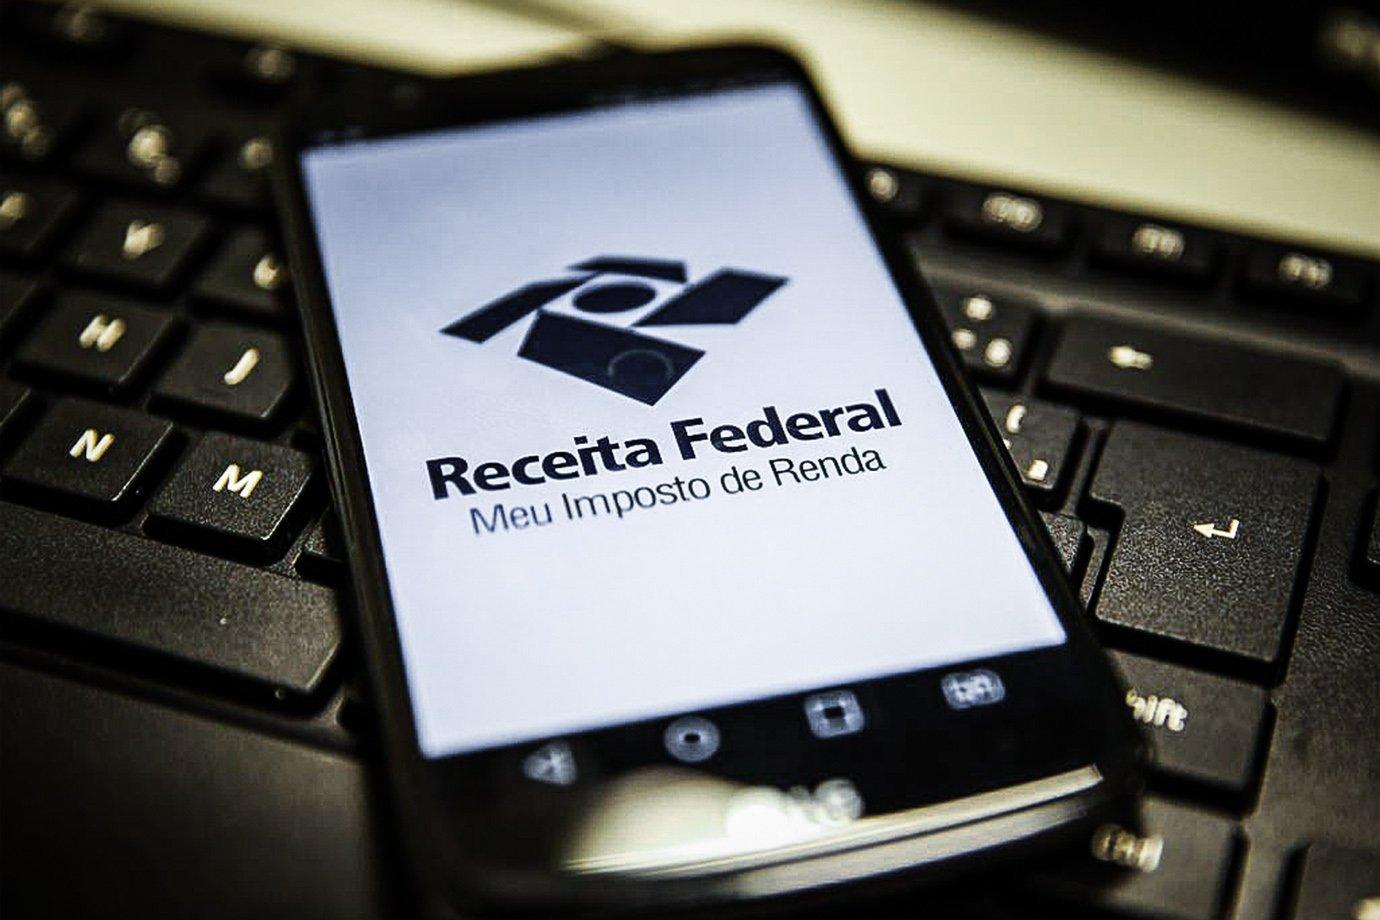 Edson Vismona: A defesa do contribuinte na Reforma do Imposto de Renda